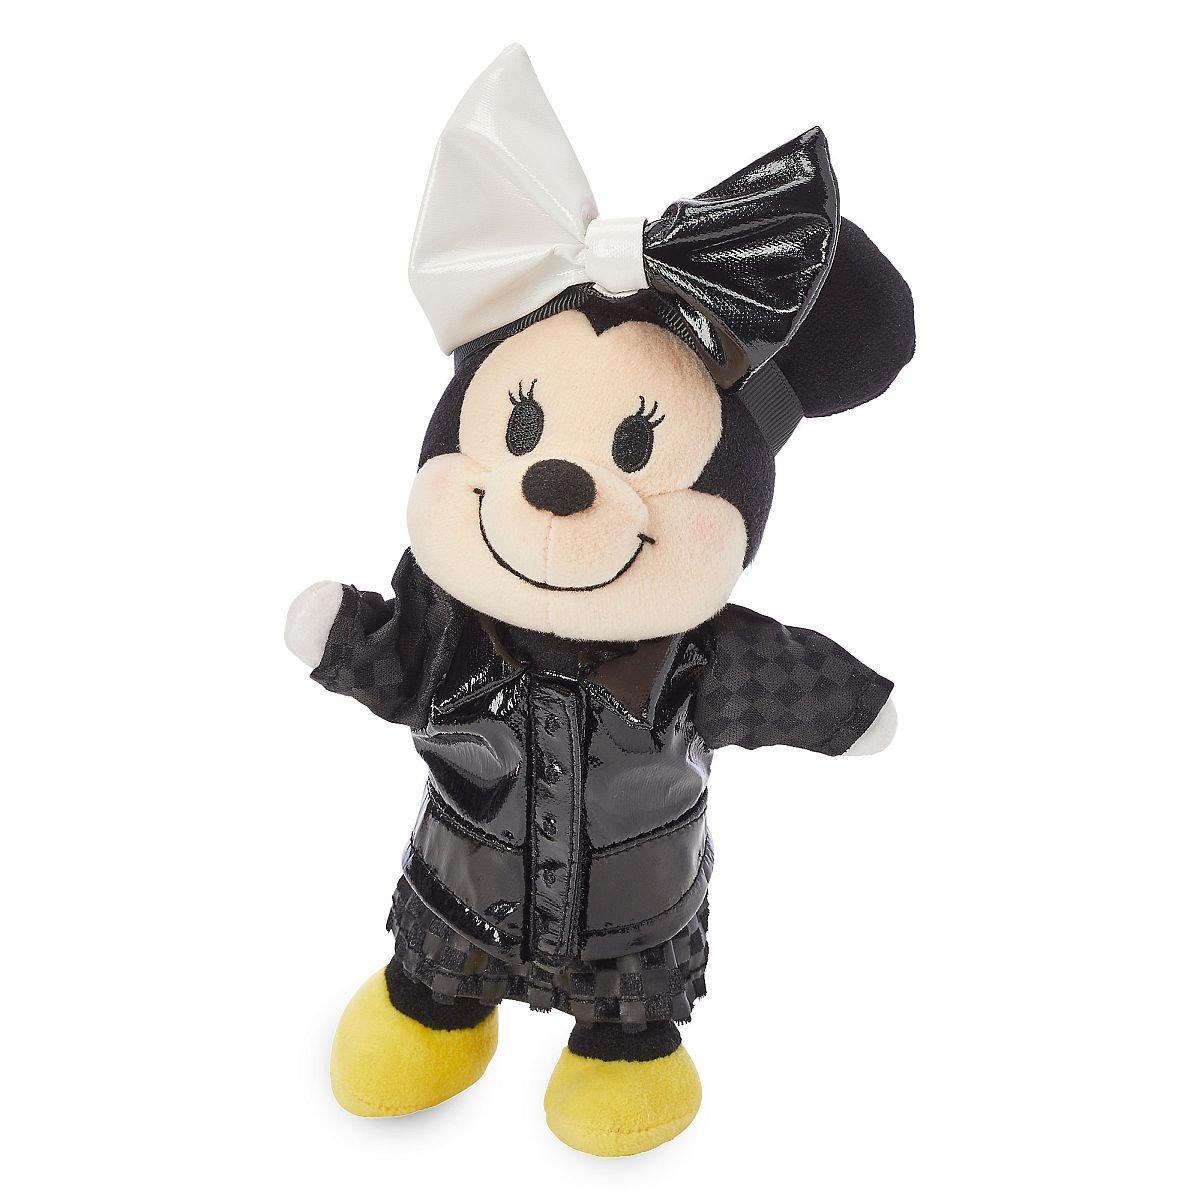 Minnie Mouse as Cruella Disney nuiMO